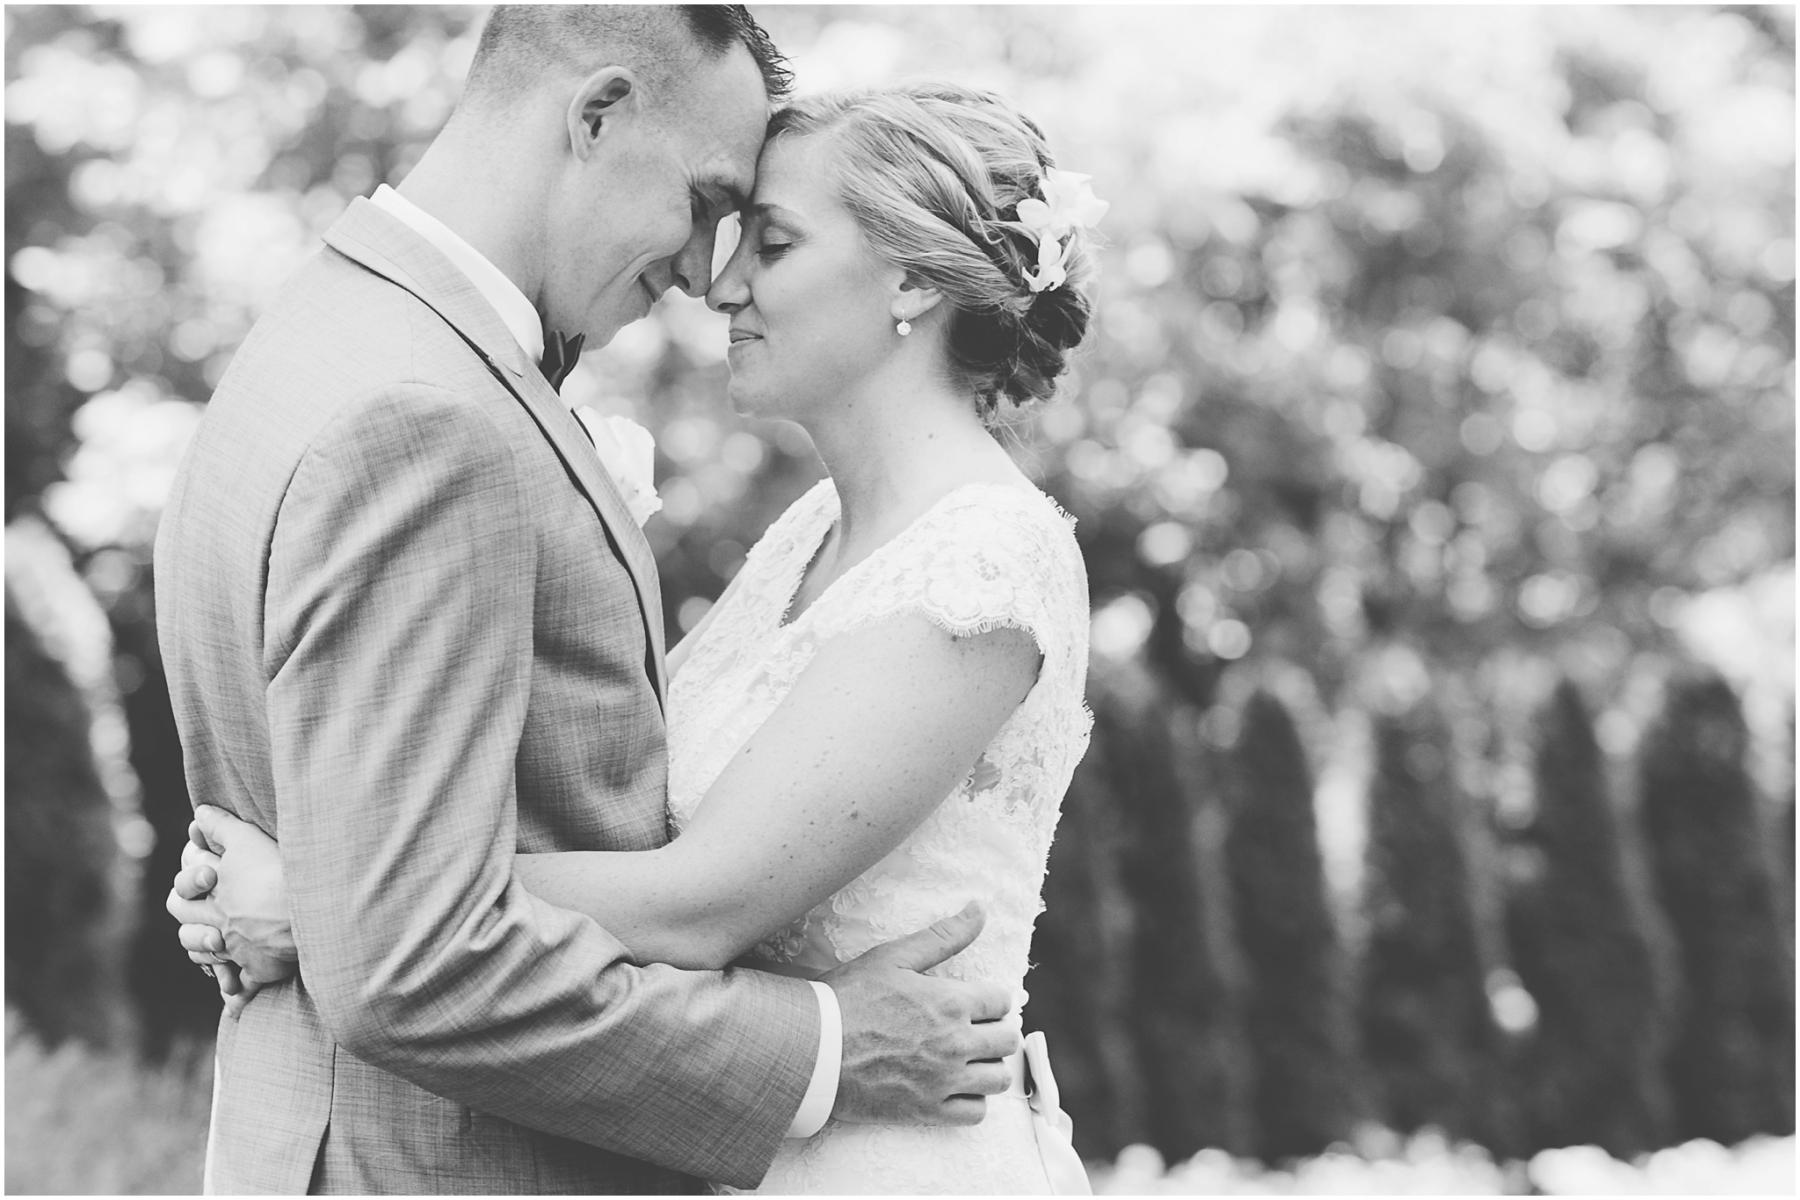 Bride and groom photo at th William Penn Inn captured by Ardita Kola Photography